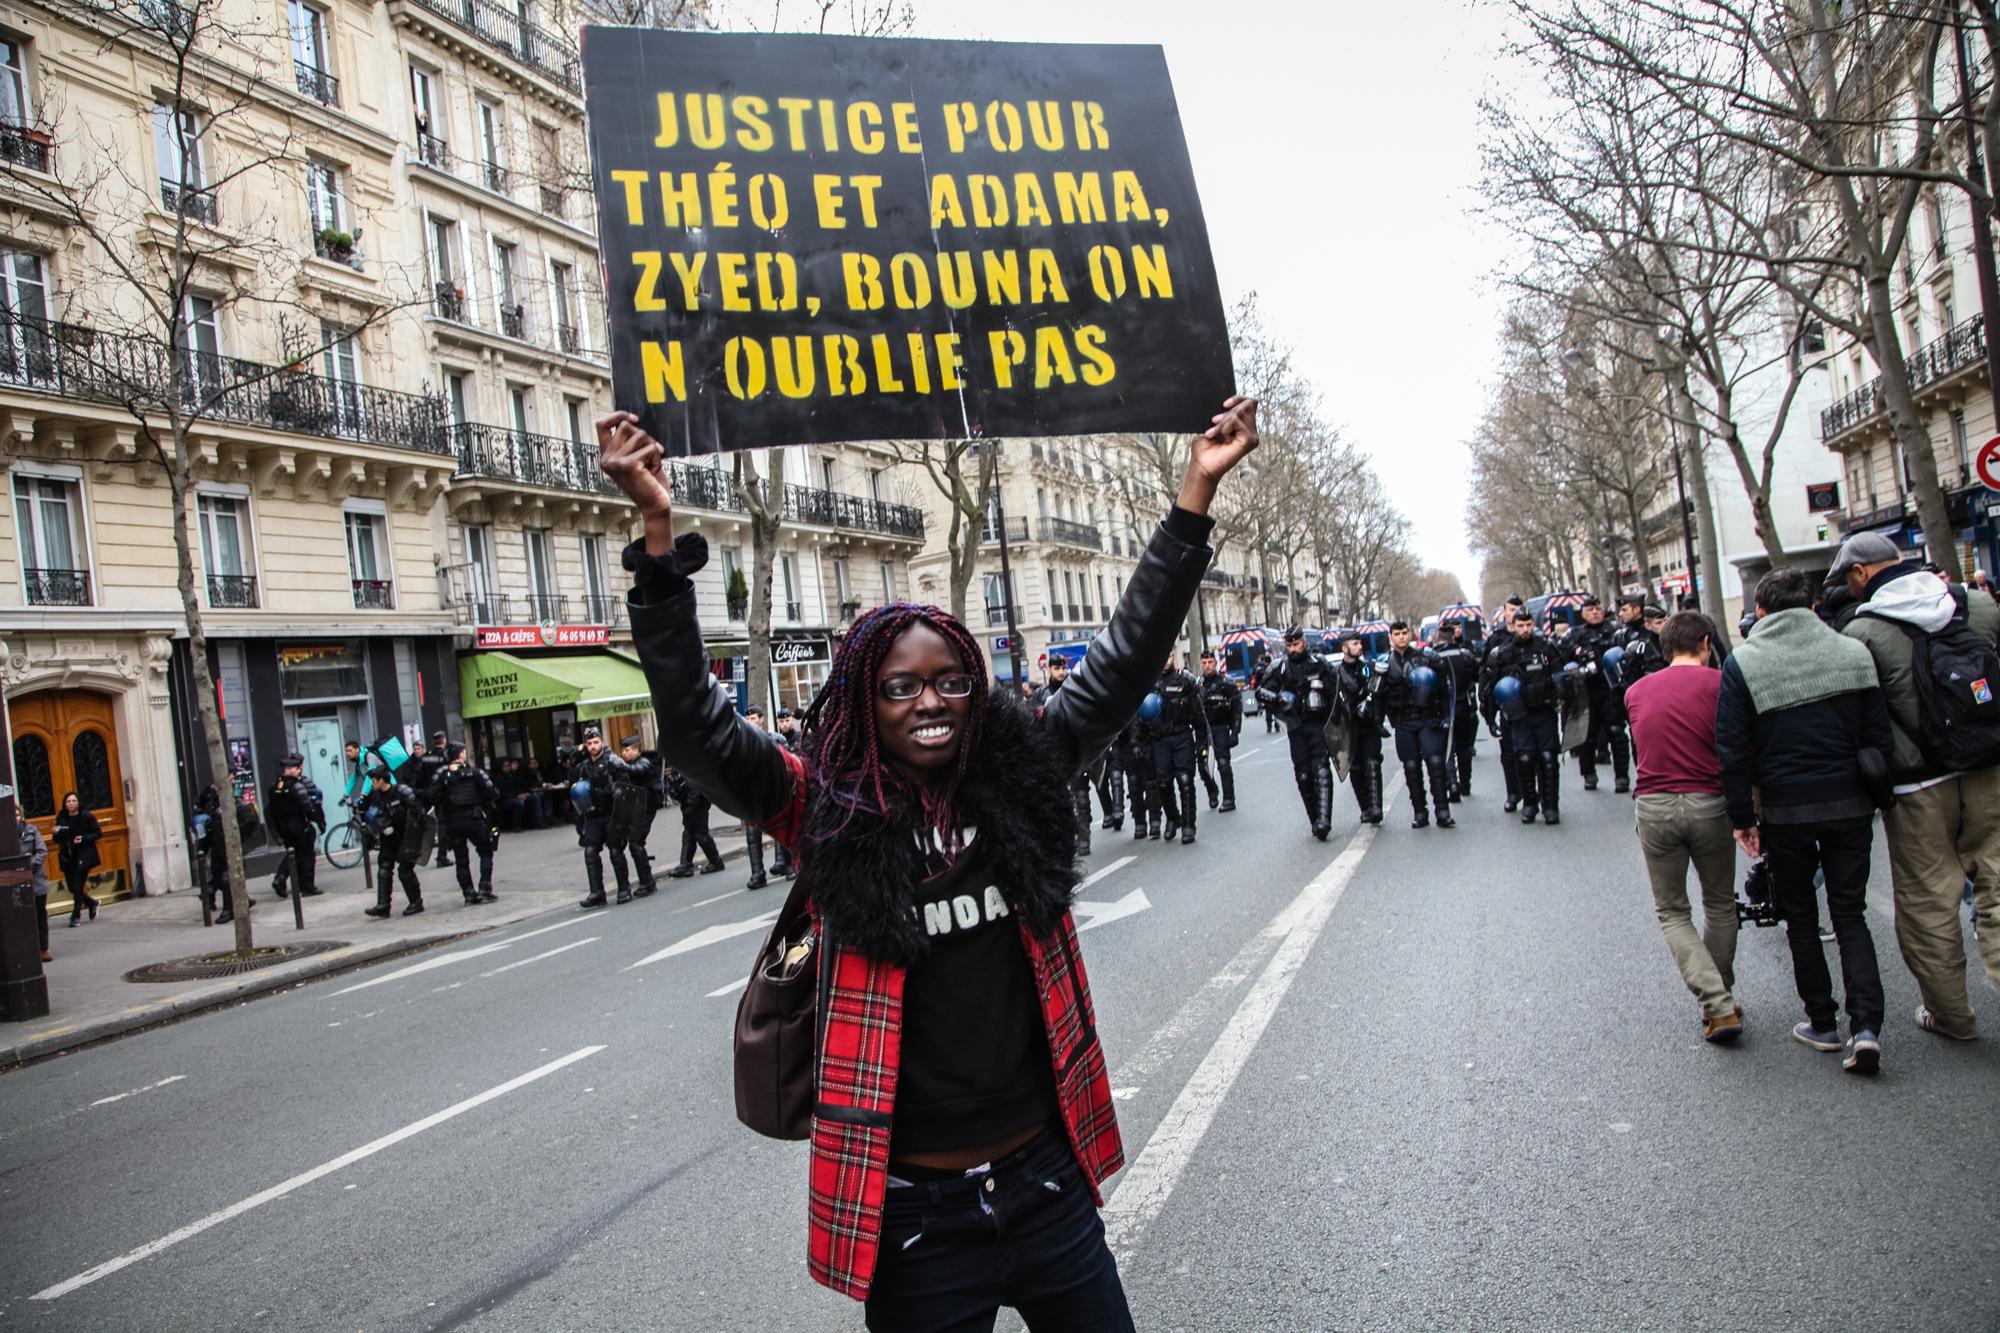 06-201703-MARCHE-CONTRE-VIOLENCES-POLICIERES©Augustin-Le_Gall-Haytham-Pictures-IMG_3695.jpg